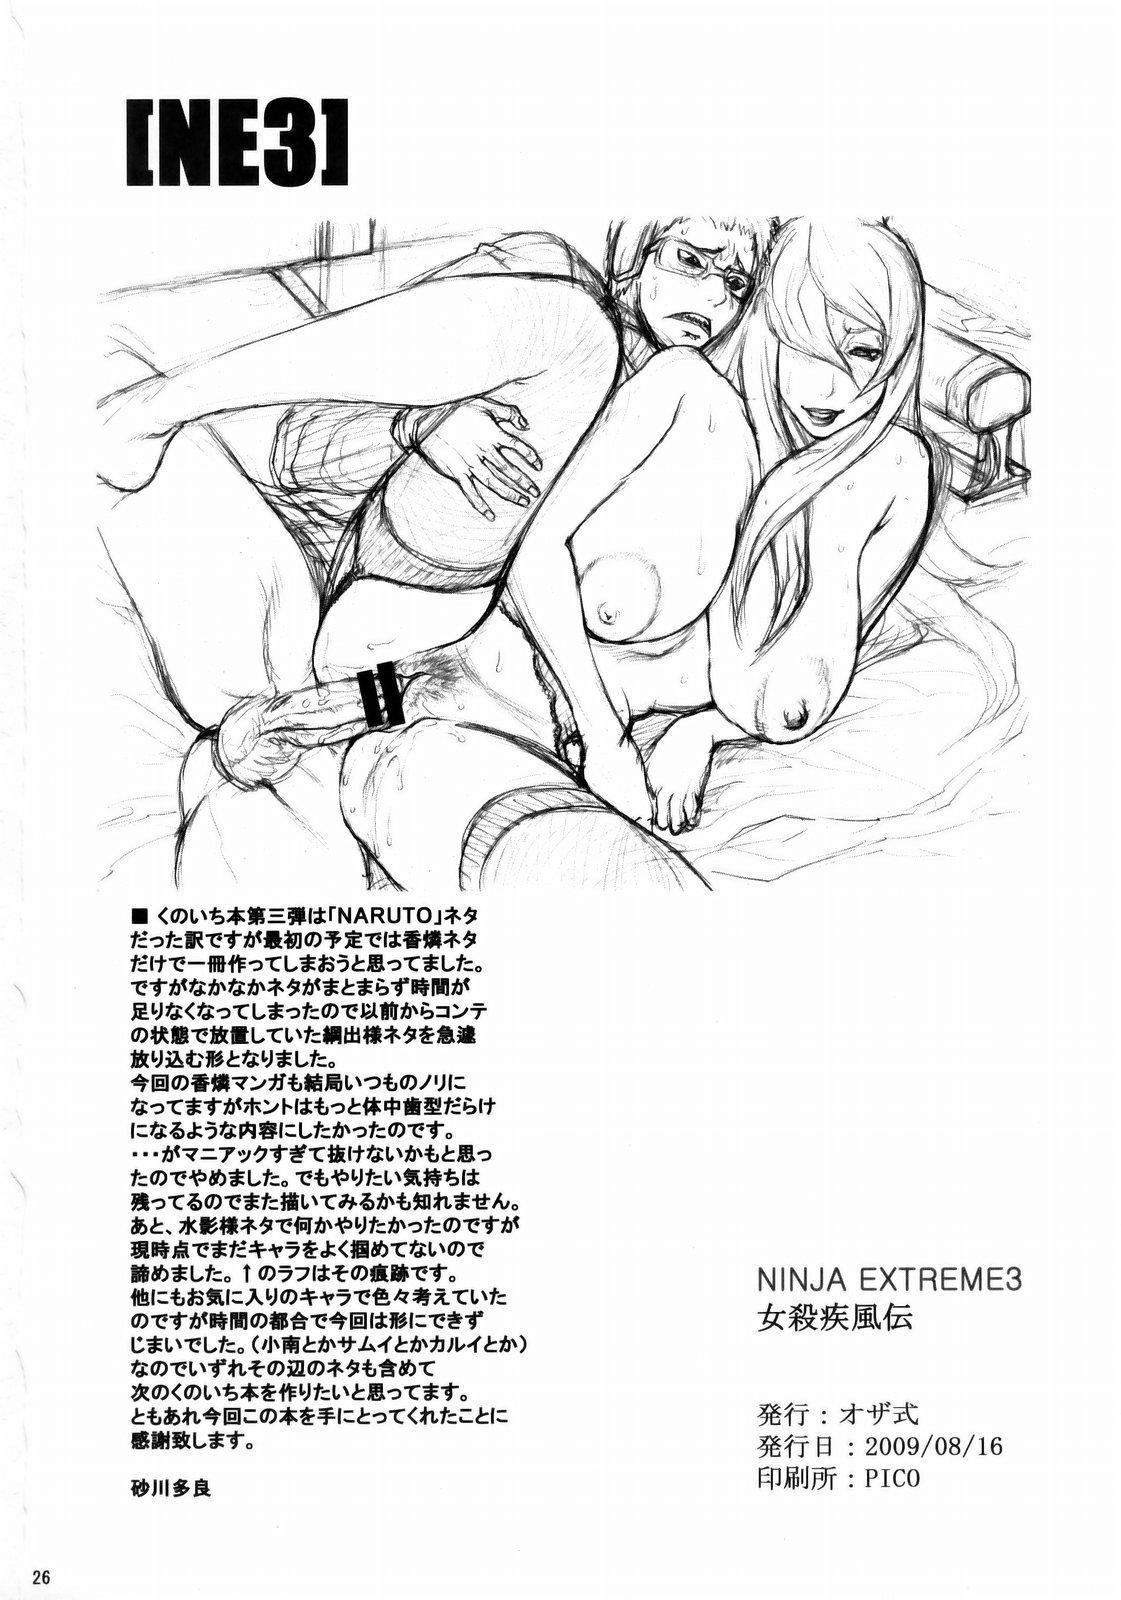 NINJA EXTREME 3 Onna Goroshi Shippuuden 24